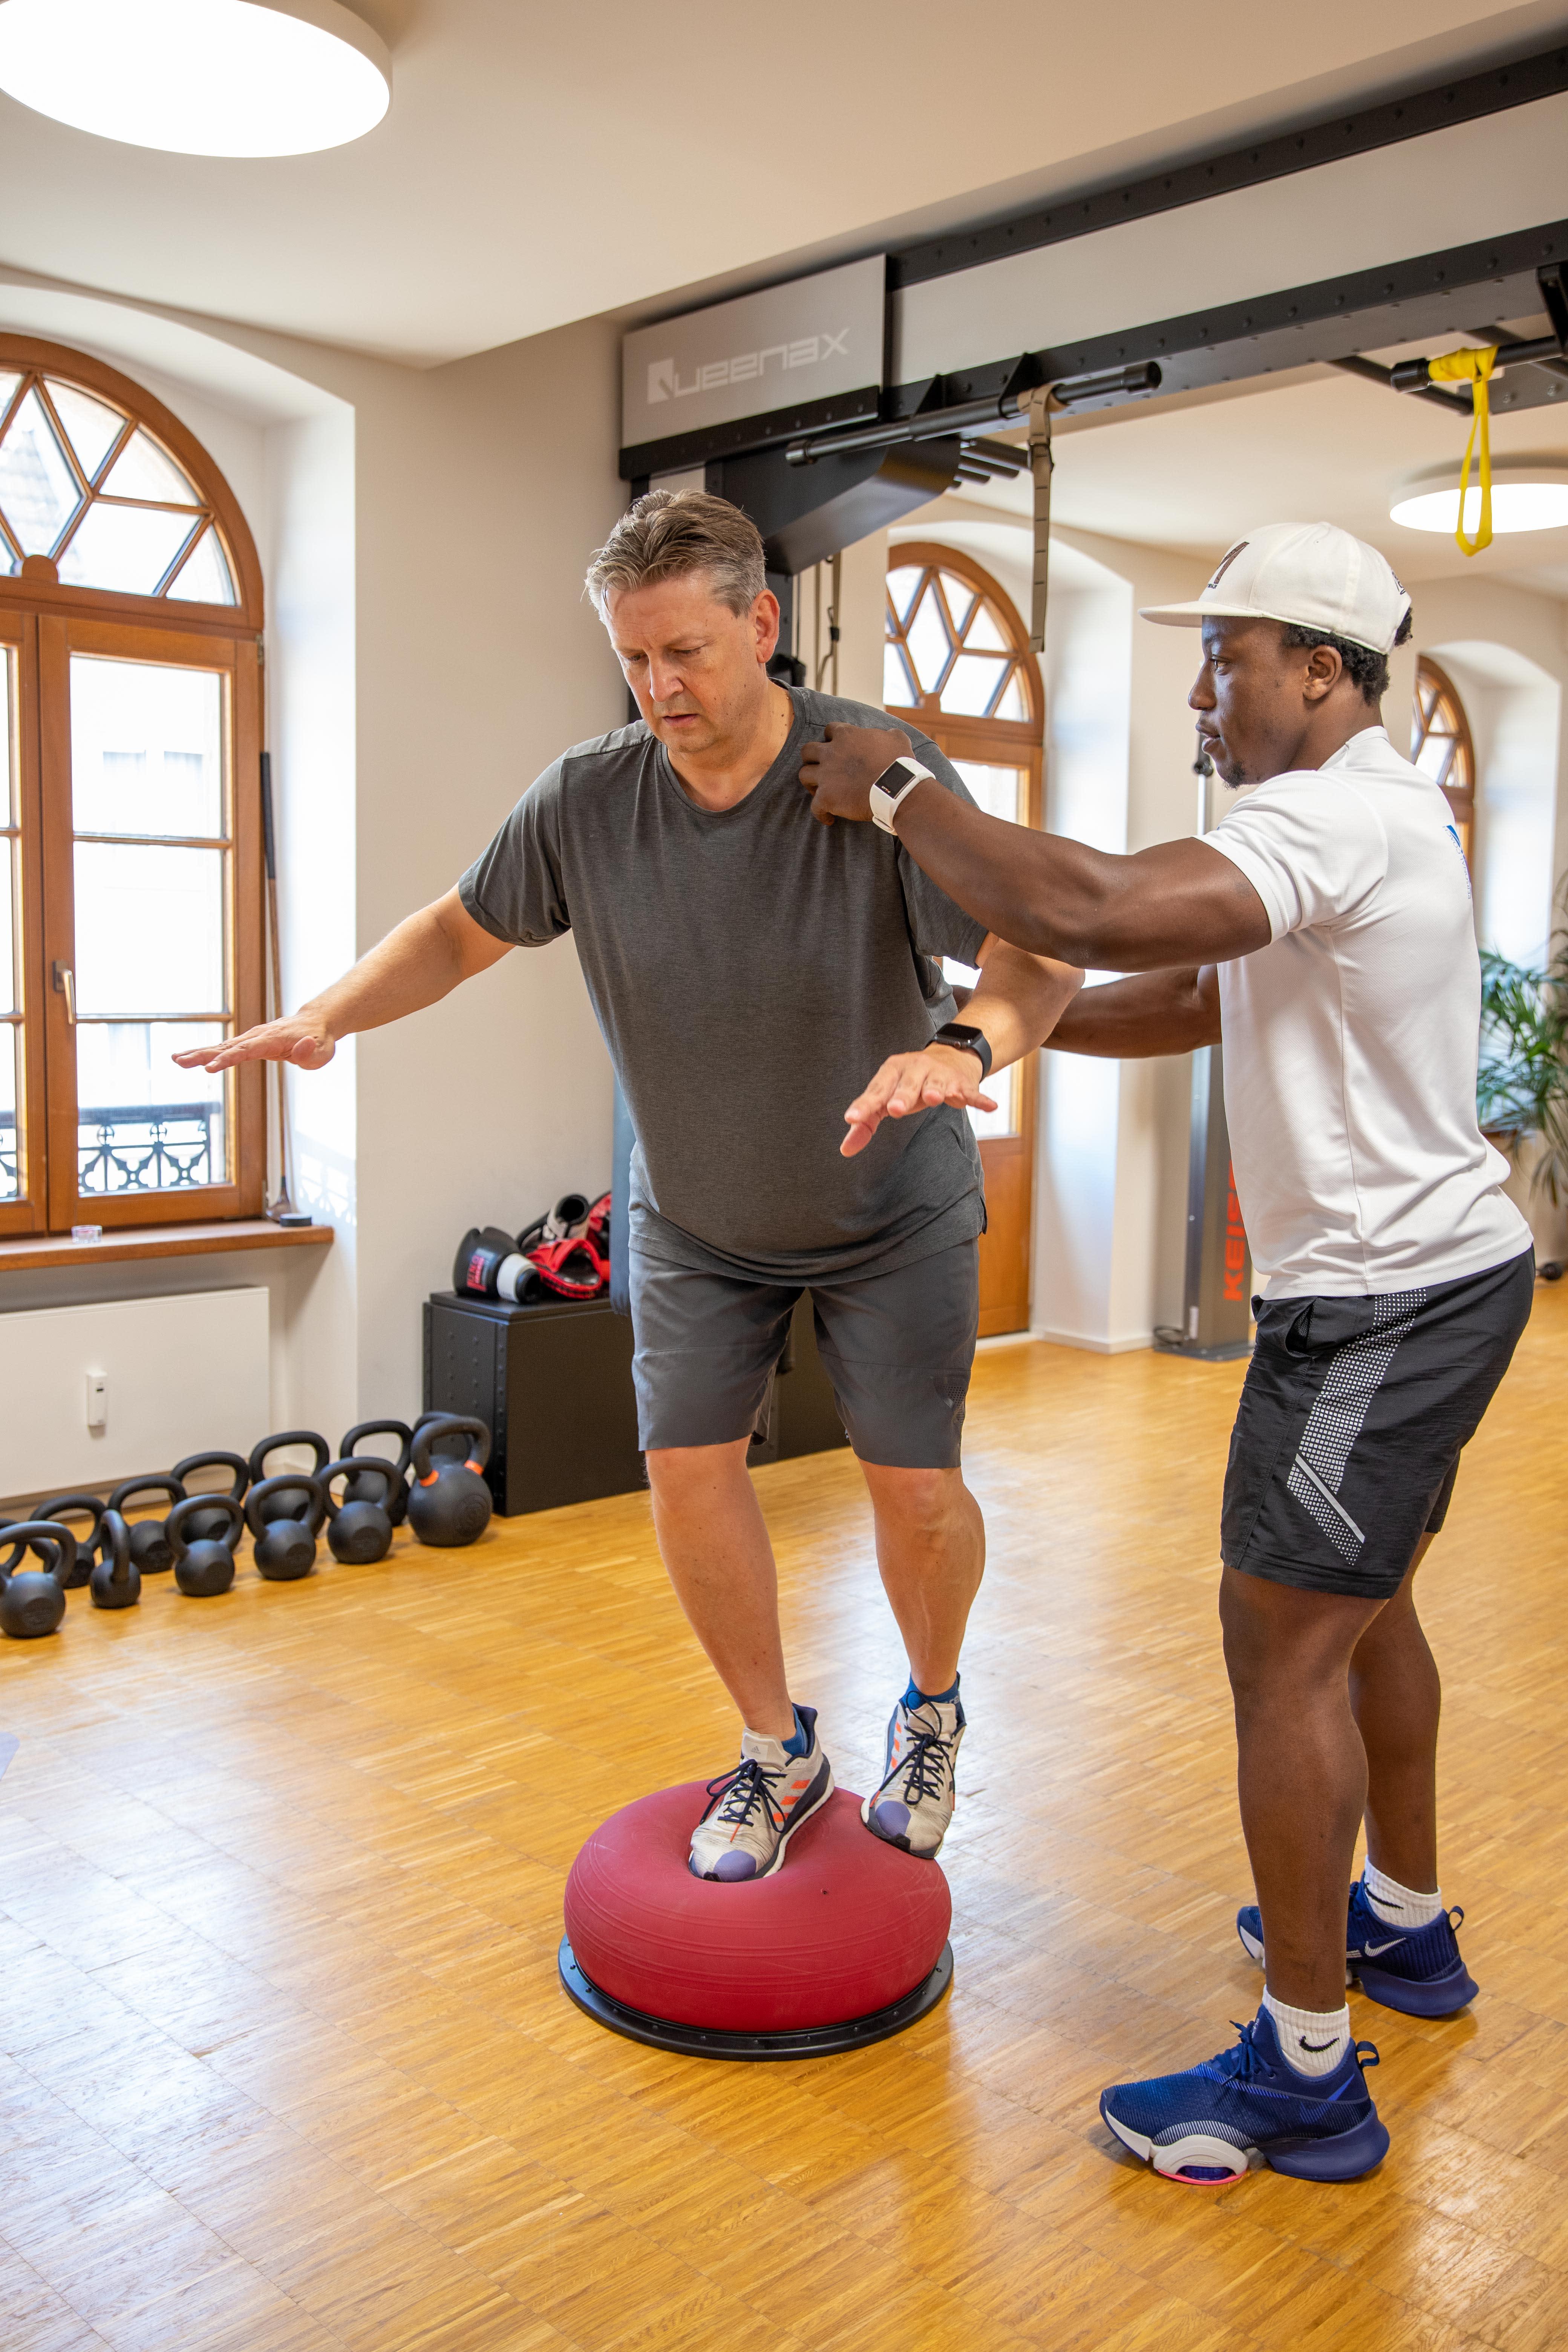 Personal Training mit Kunde Ballübung